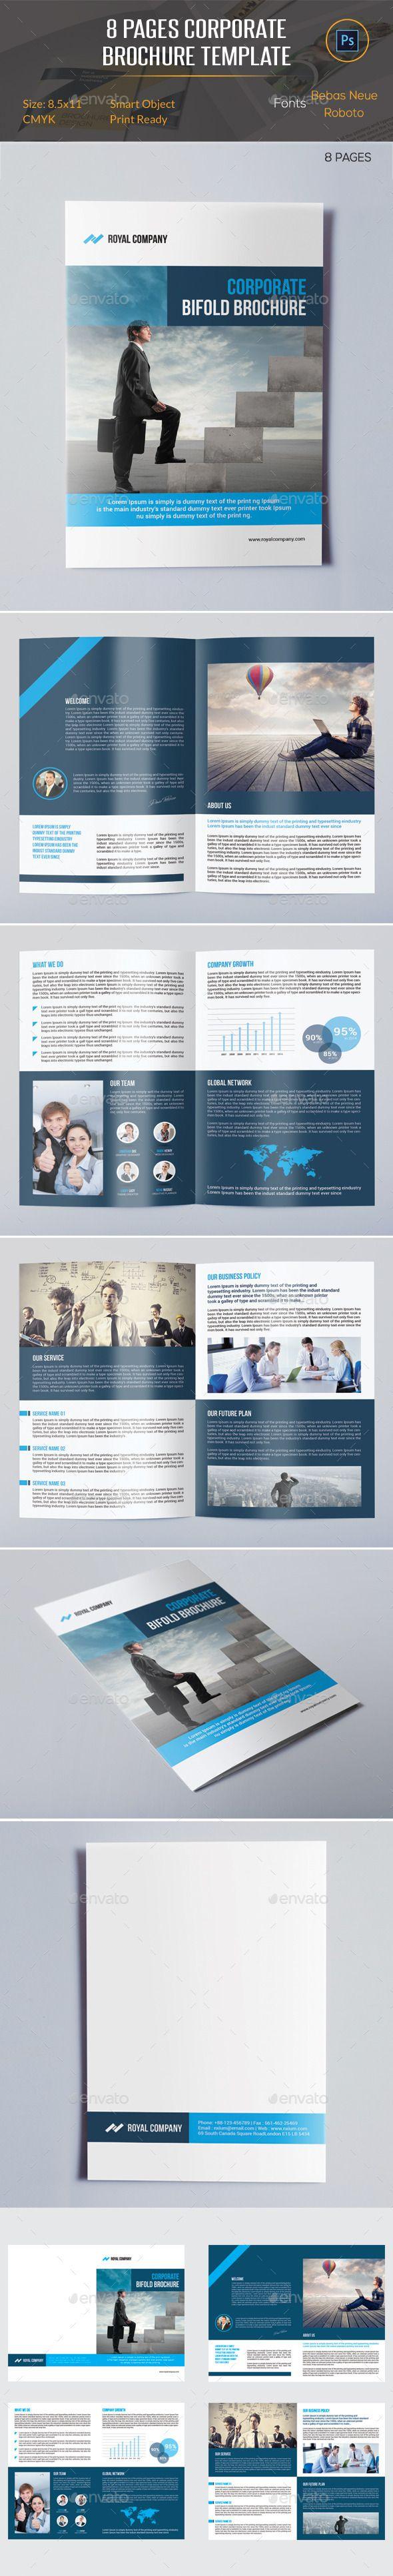 Pages Brochure Template Brochure Template Brochures And Template - 8 page brochure template